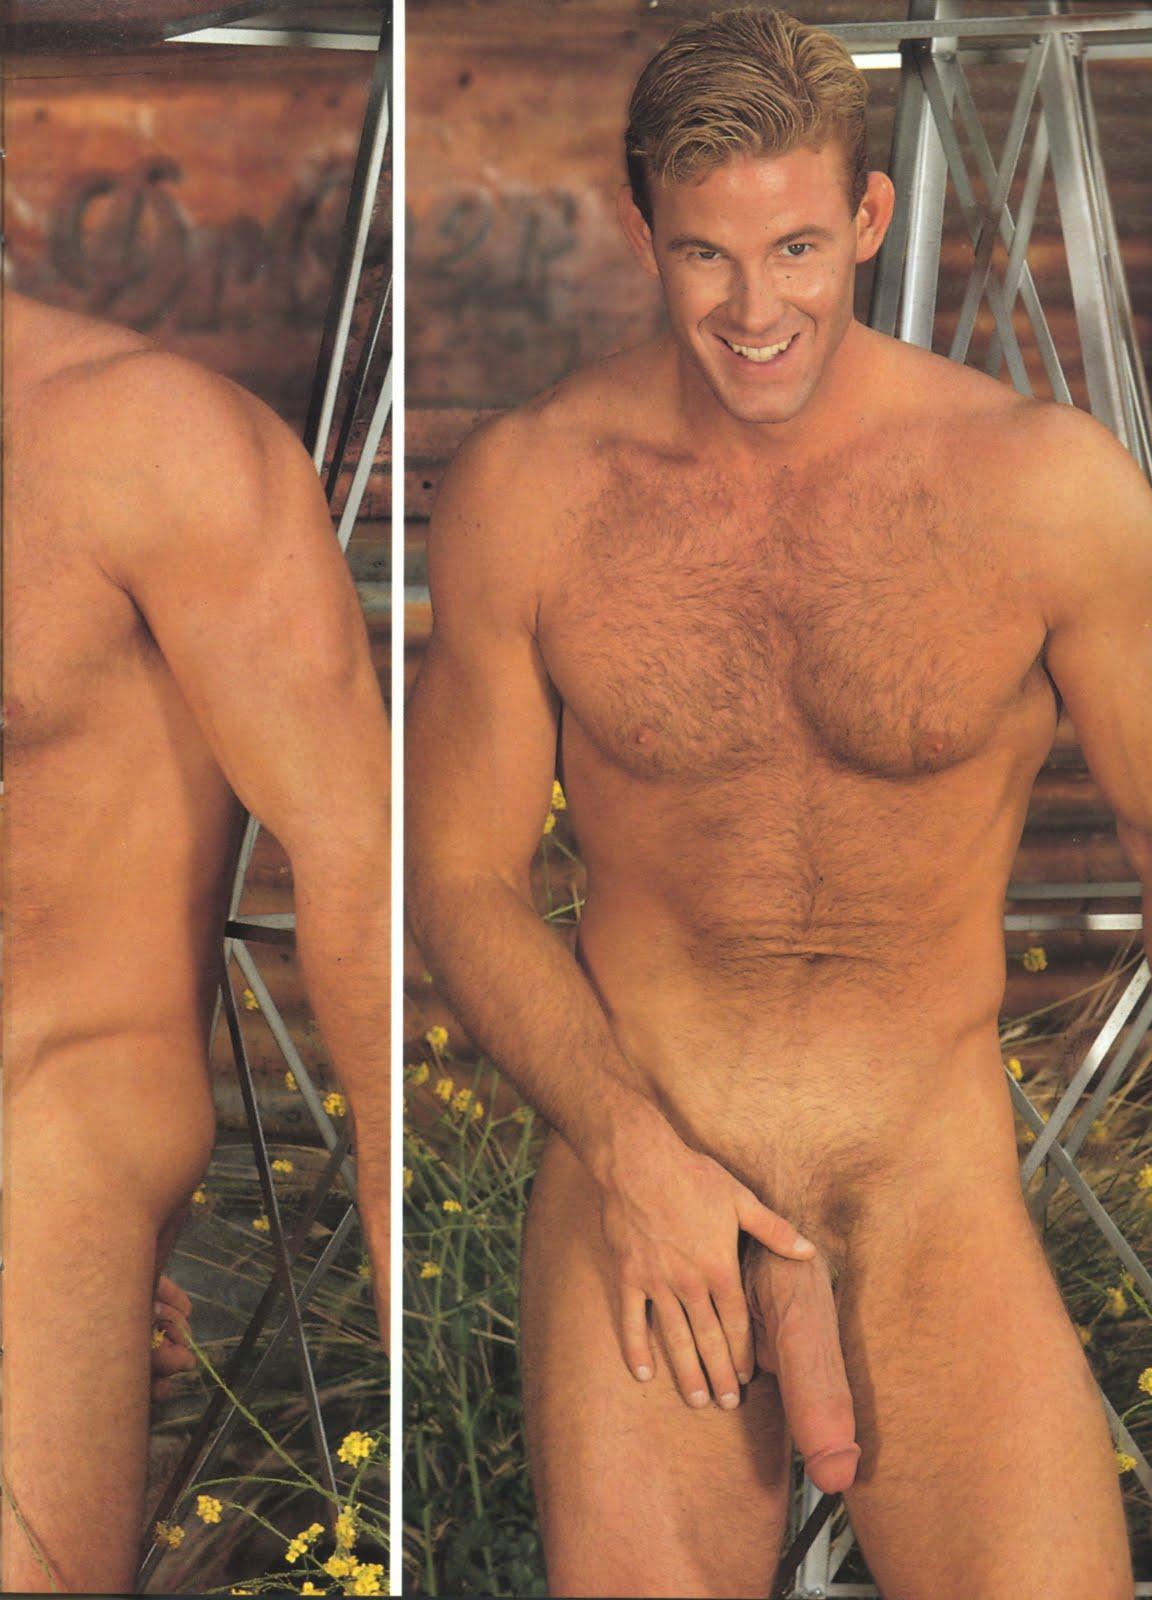 ken ryker gay porn Ken Ryker & Jake Andrews - XNXX.COM.